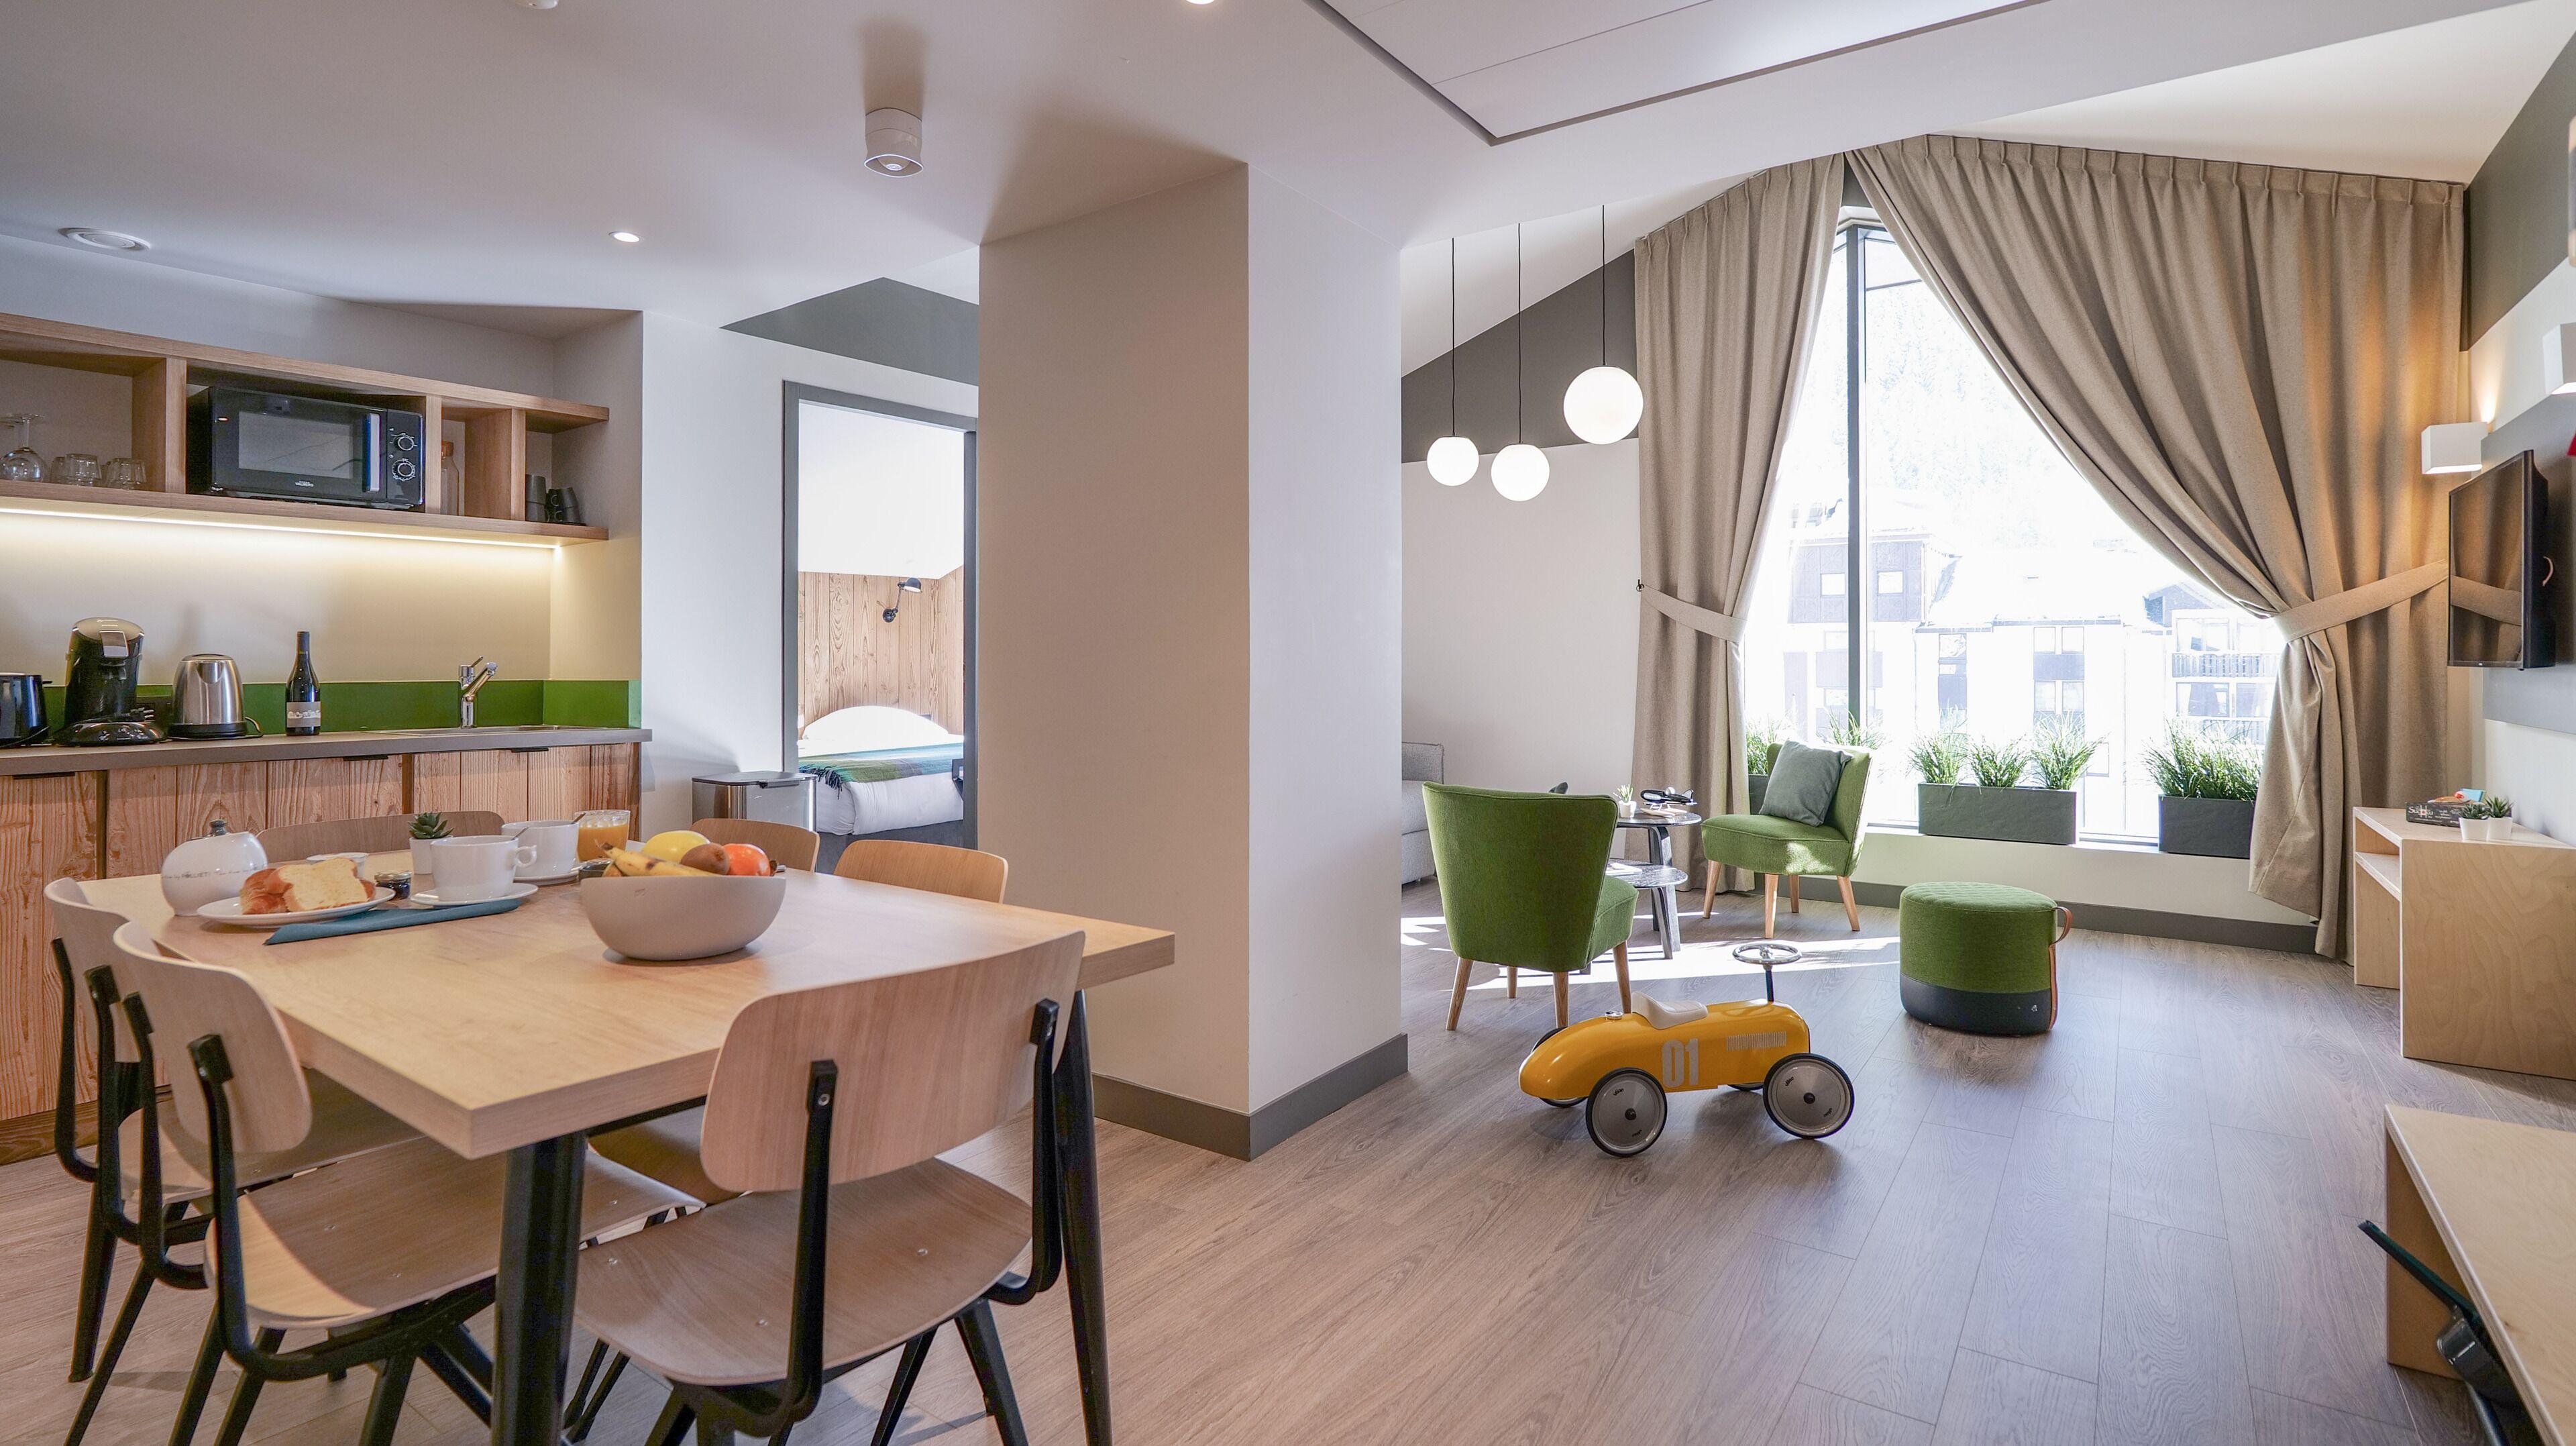 Plan B Hotel - Living Chamonix